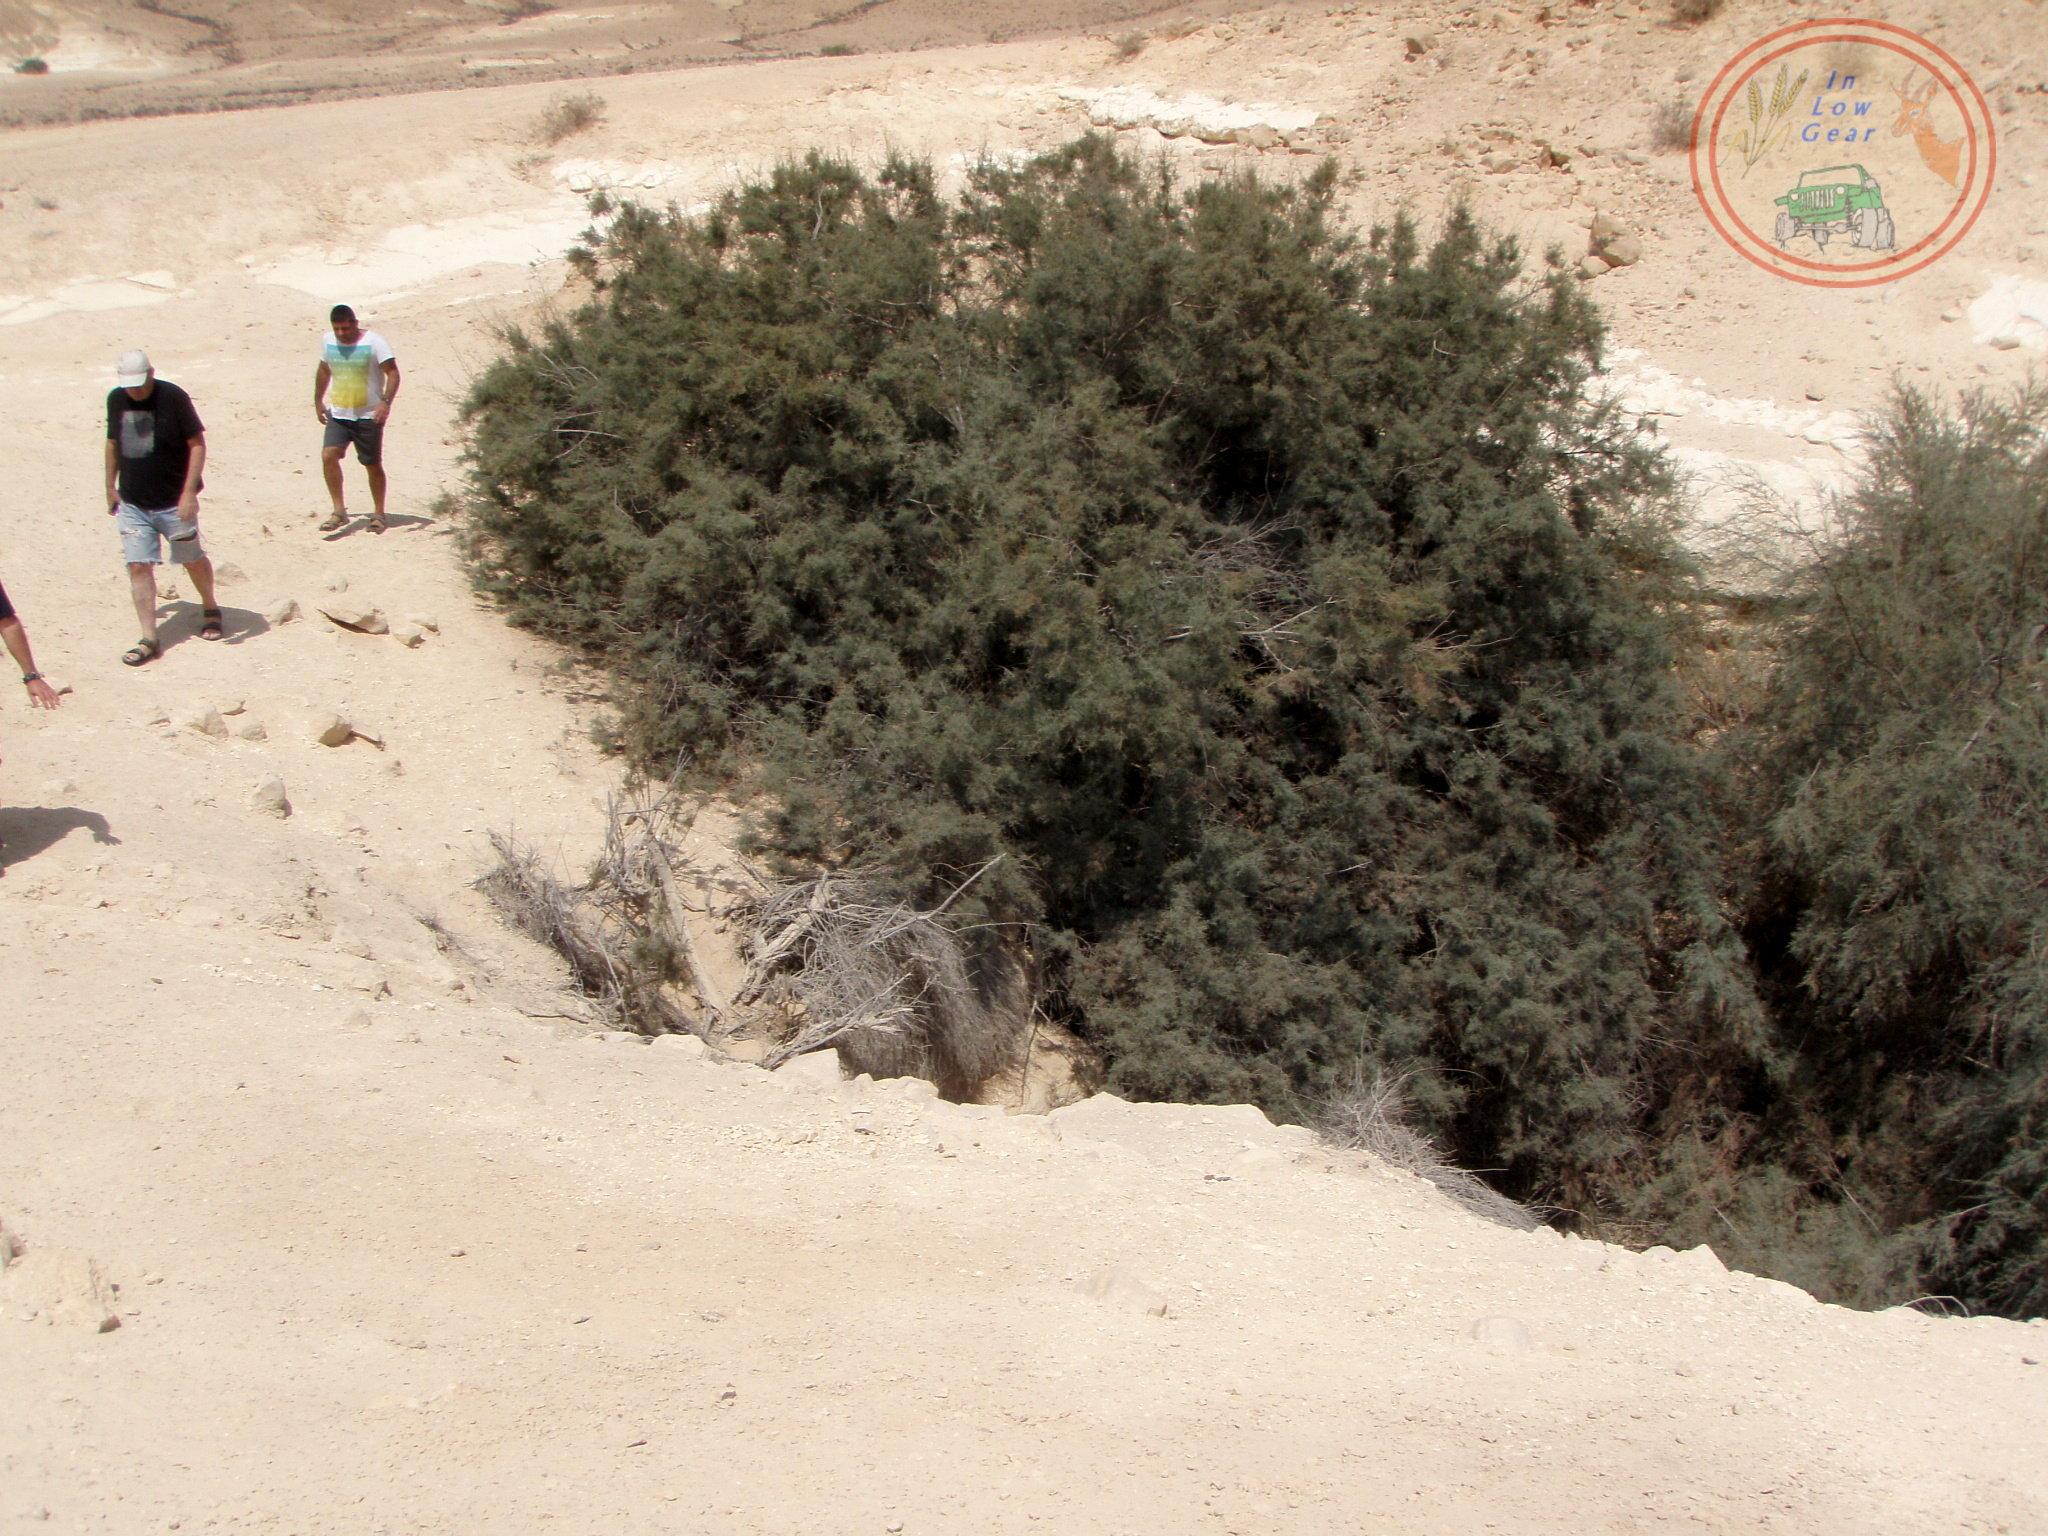 A desert Tamarix pointing at a large water hole Negev desert jeep tours. אשל מצביע על מארורת מים בהר הנגב טיולי ג'יפים